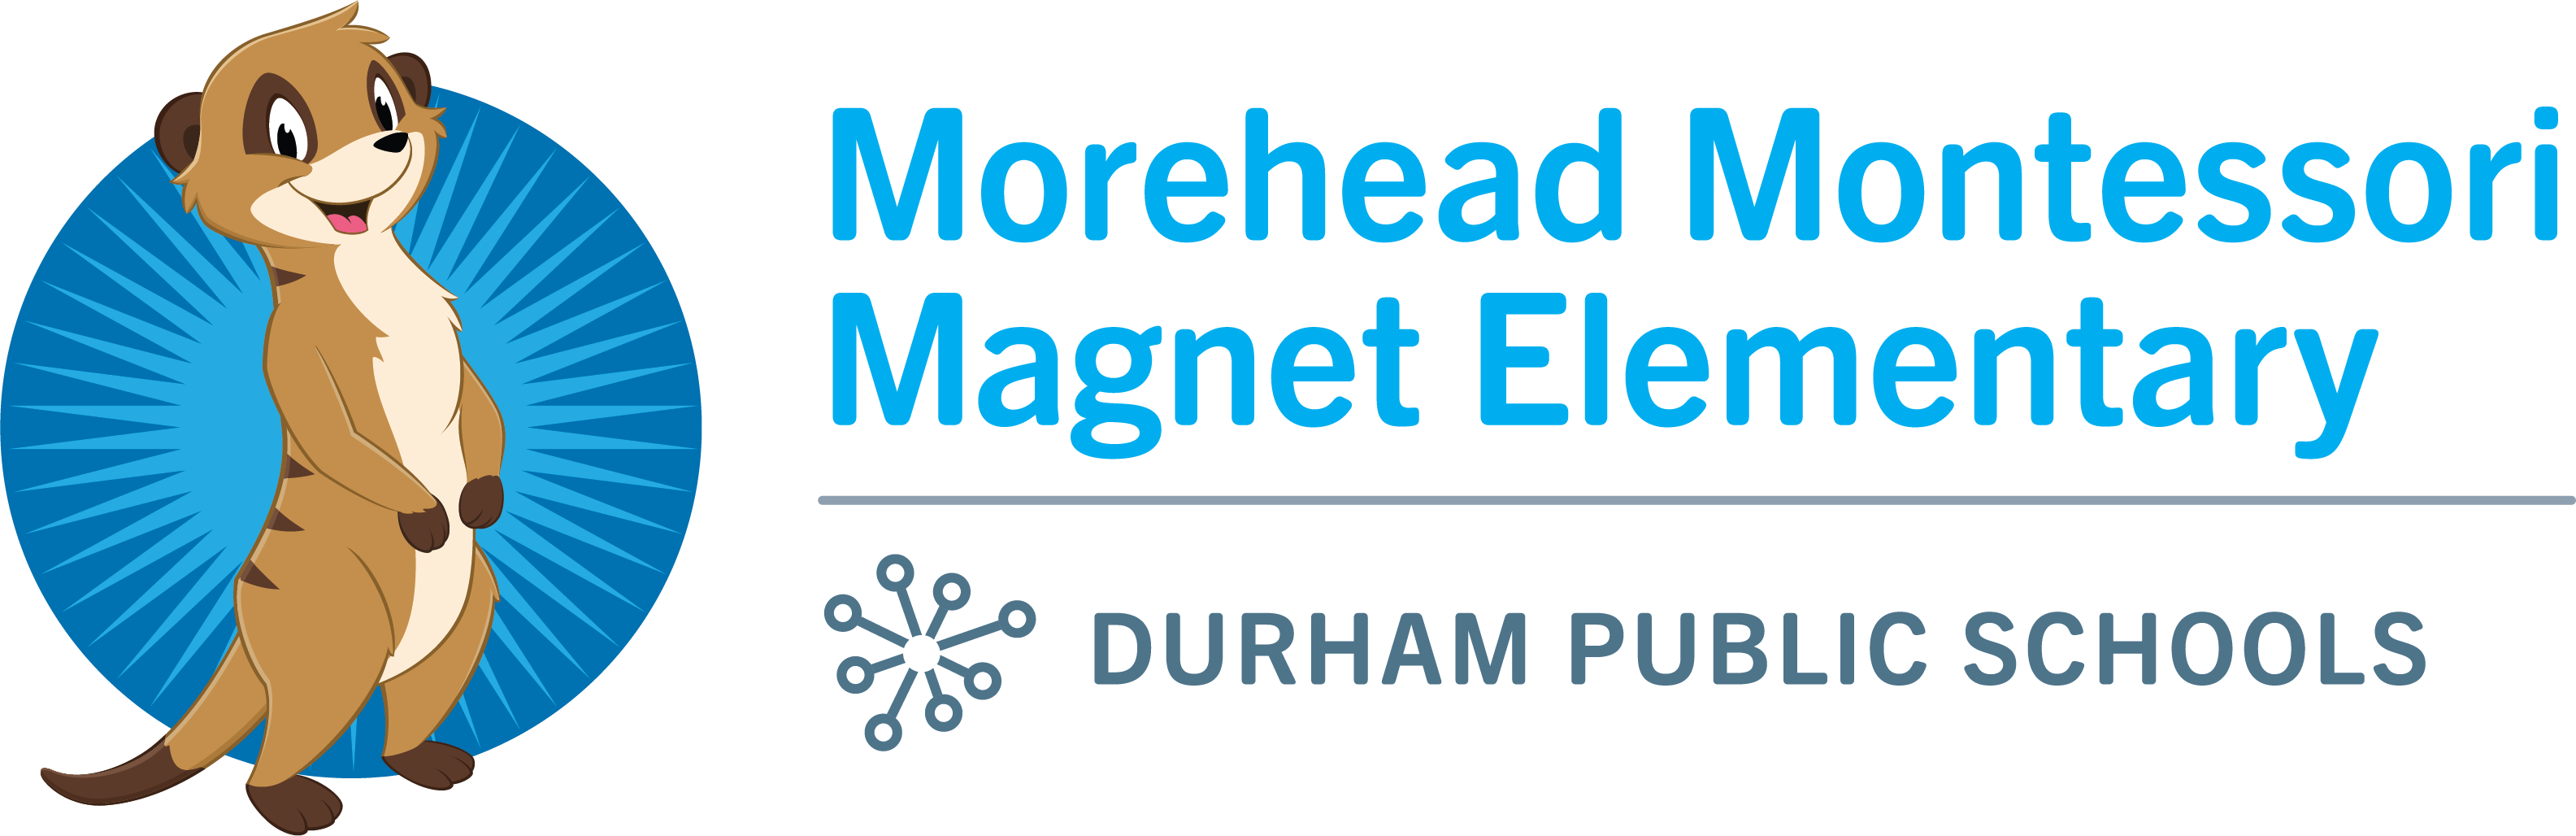 Morehead Montessori Magnet Elementary Homepage